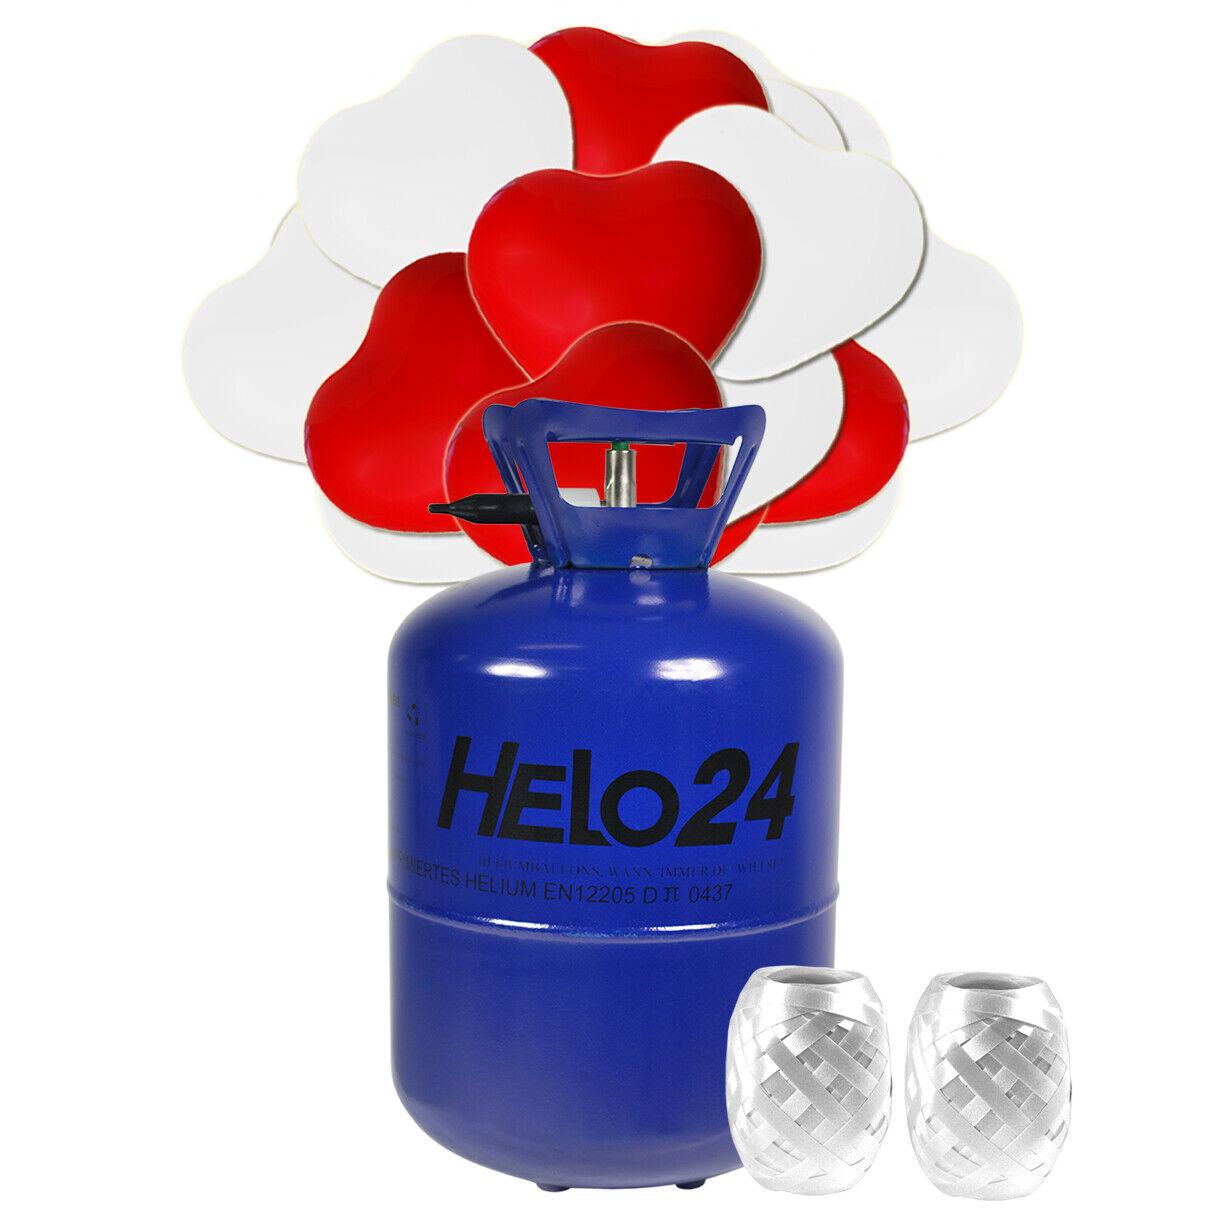 Helium Ballongas  ca. 0,42 m³ inkl 50 50 50 Luftballons Hochzeit HERZ ROT und WEIß ed7e7d